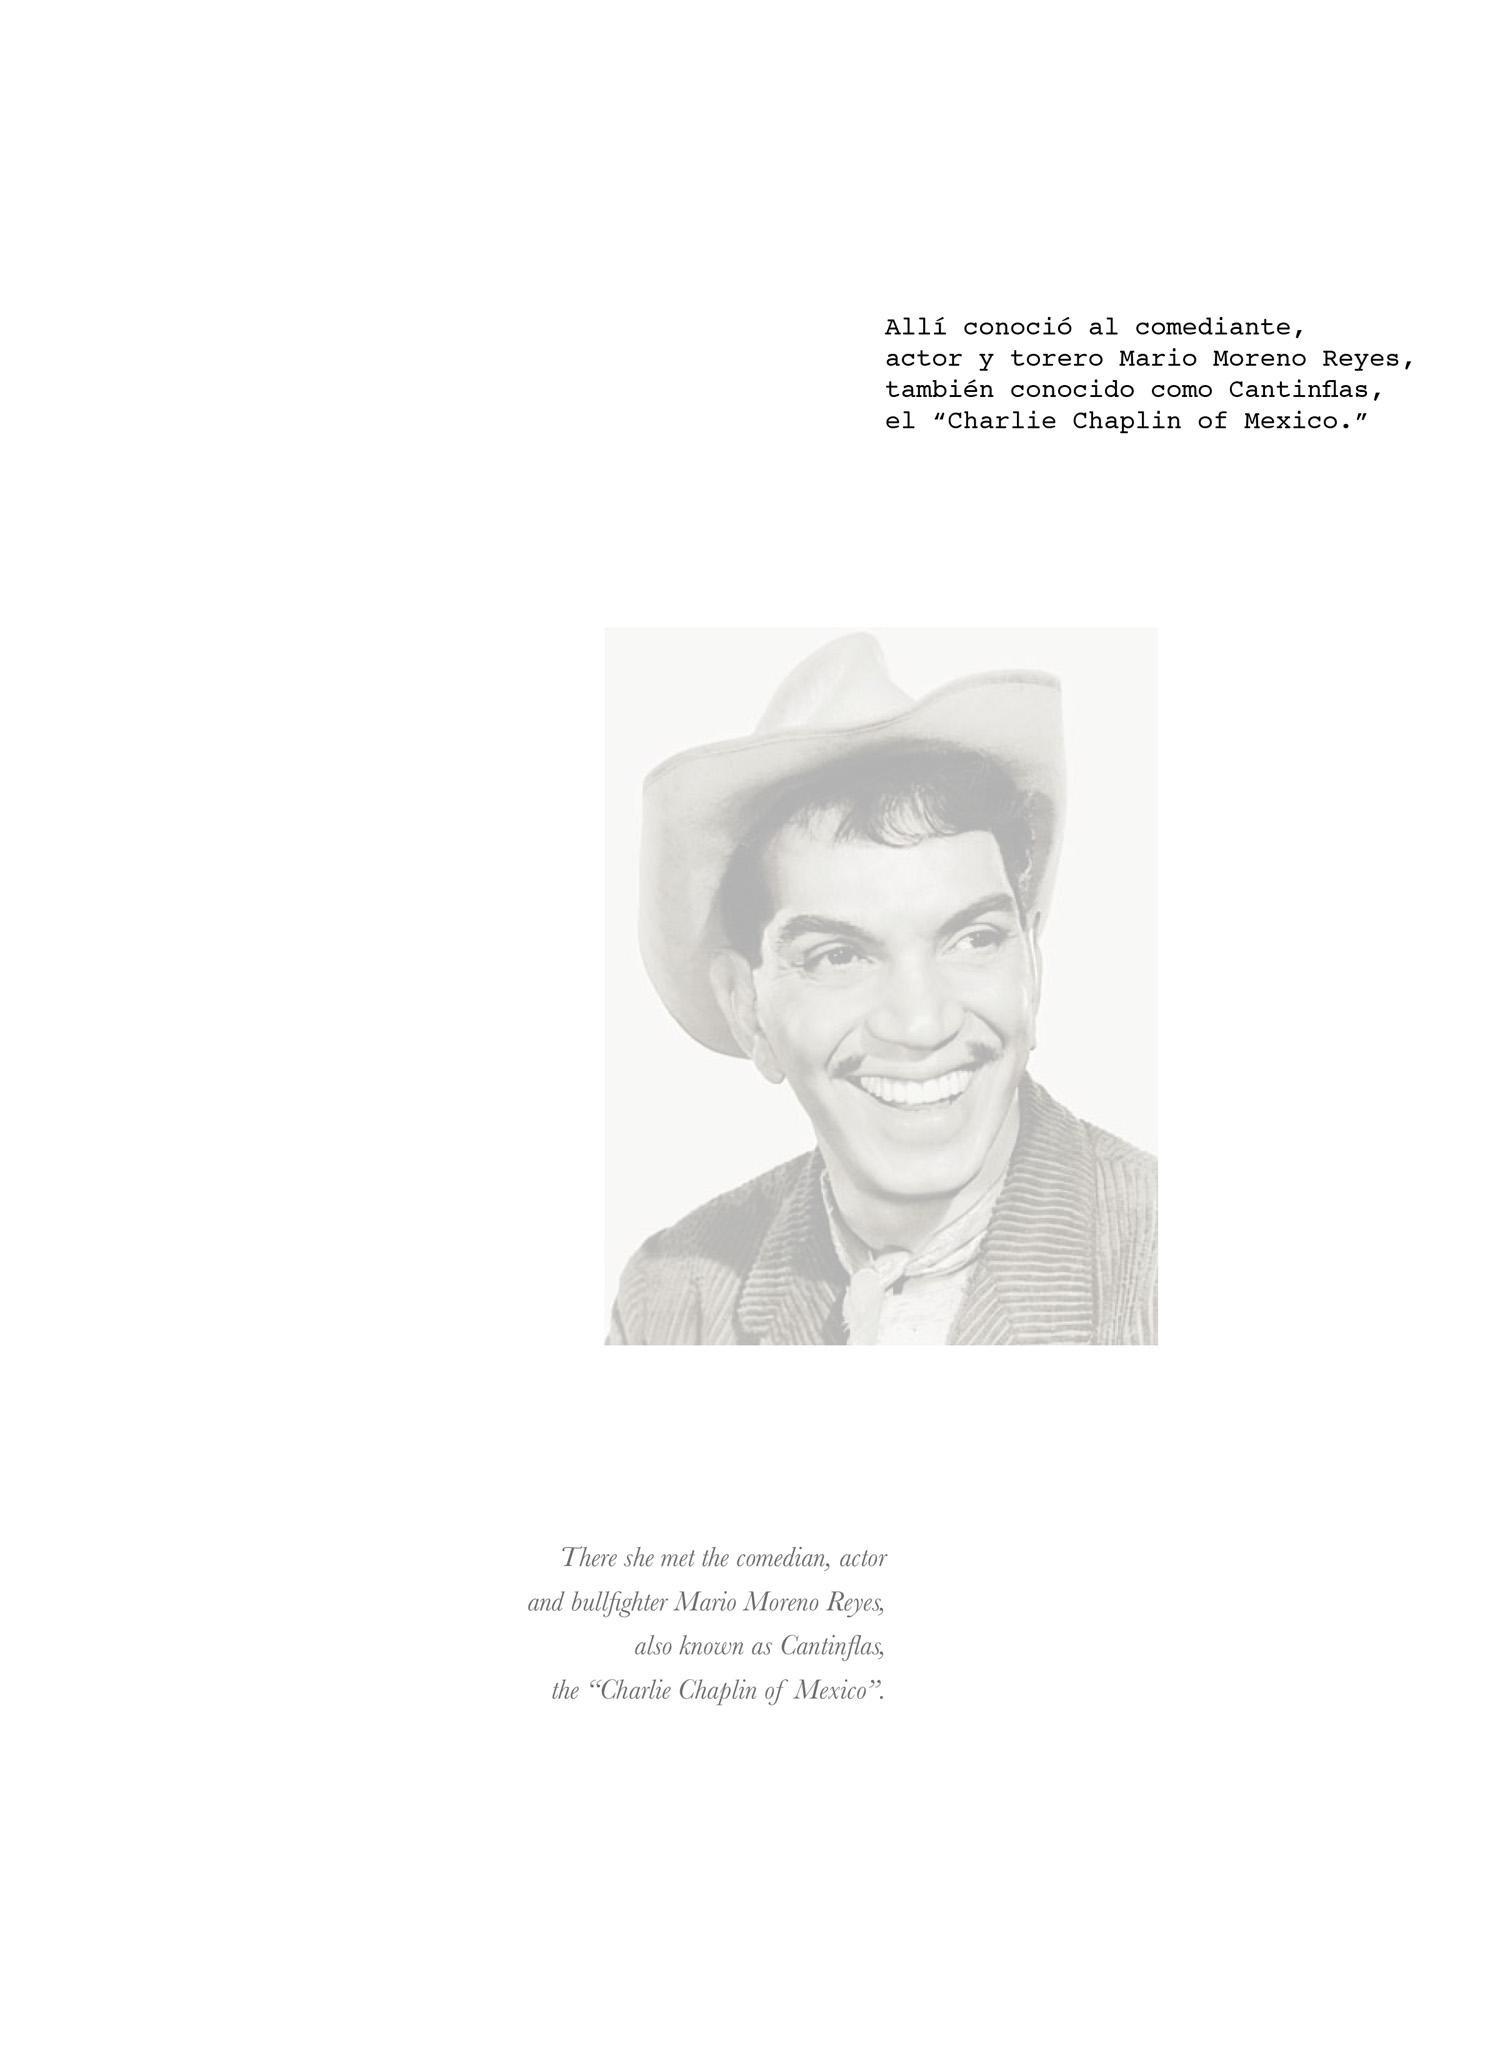 mexico book composite10.jpg